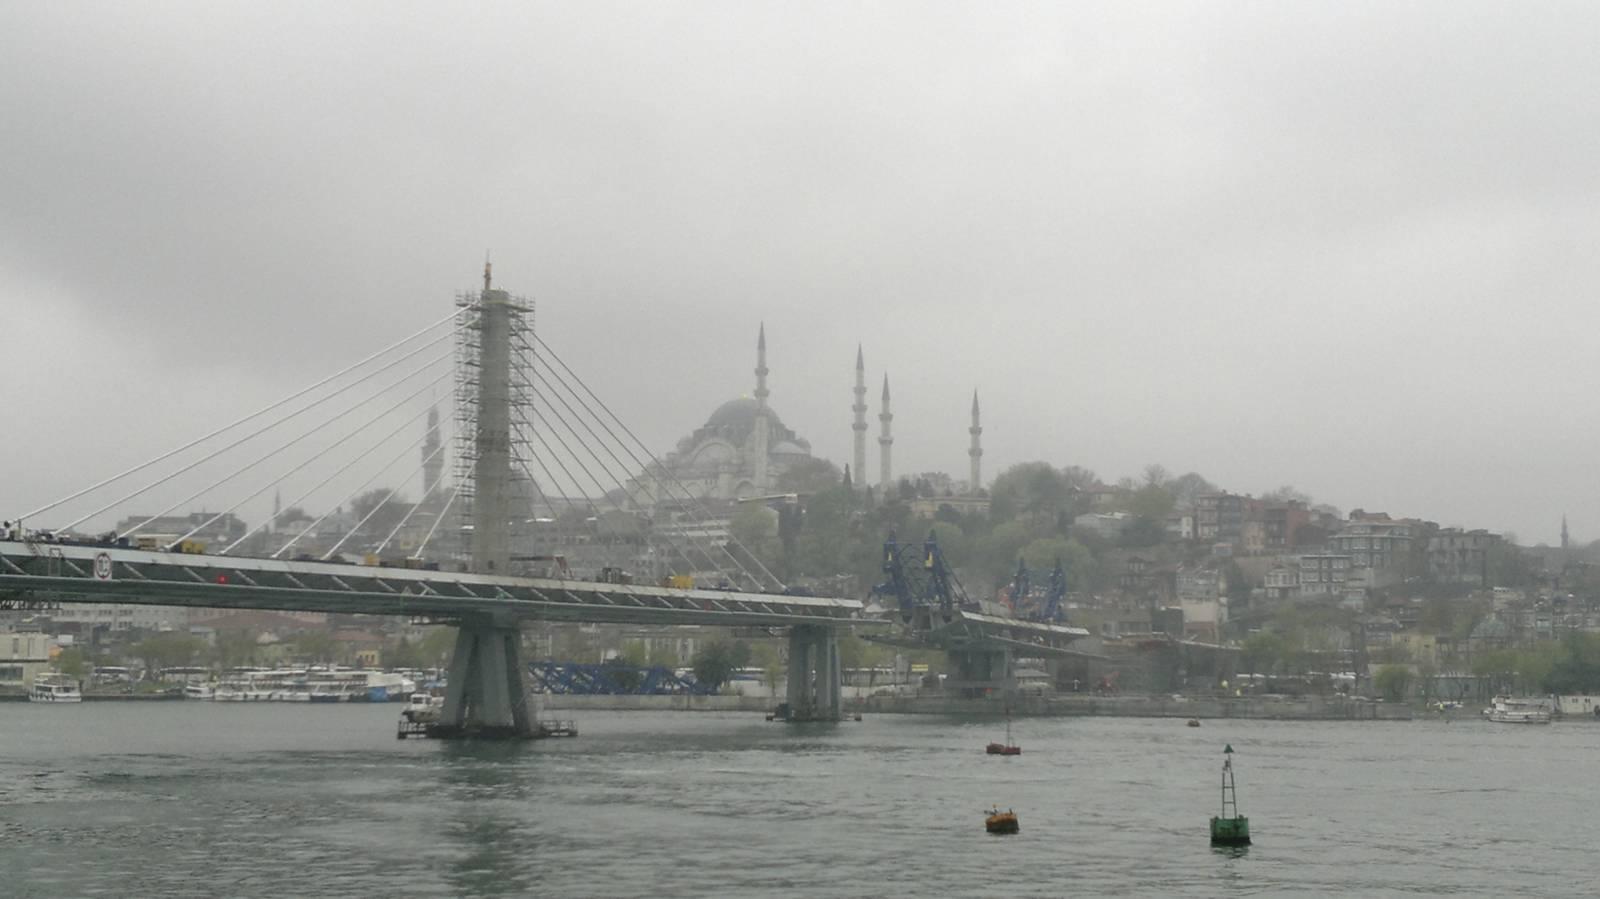 Istanbul-halic-bridge-ponte-turchia-turkey